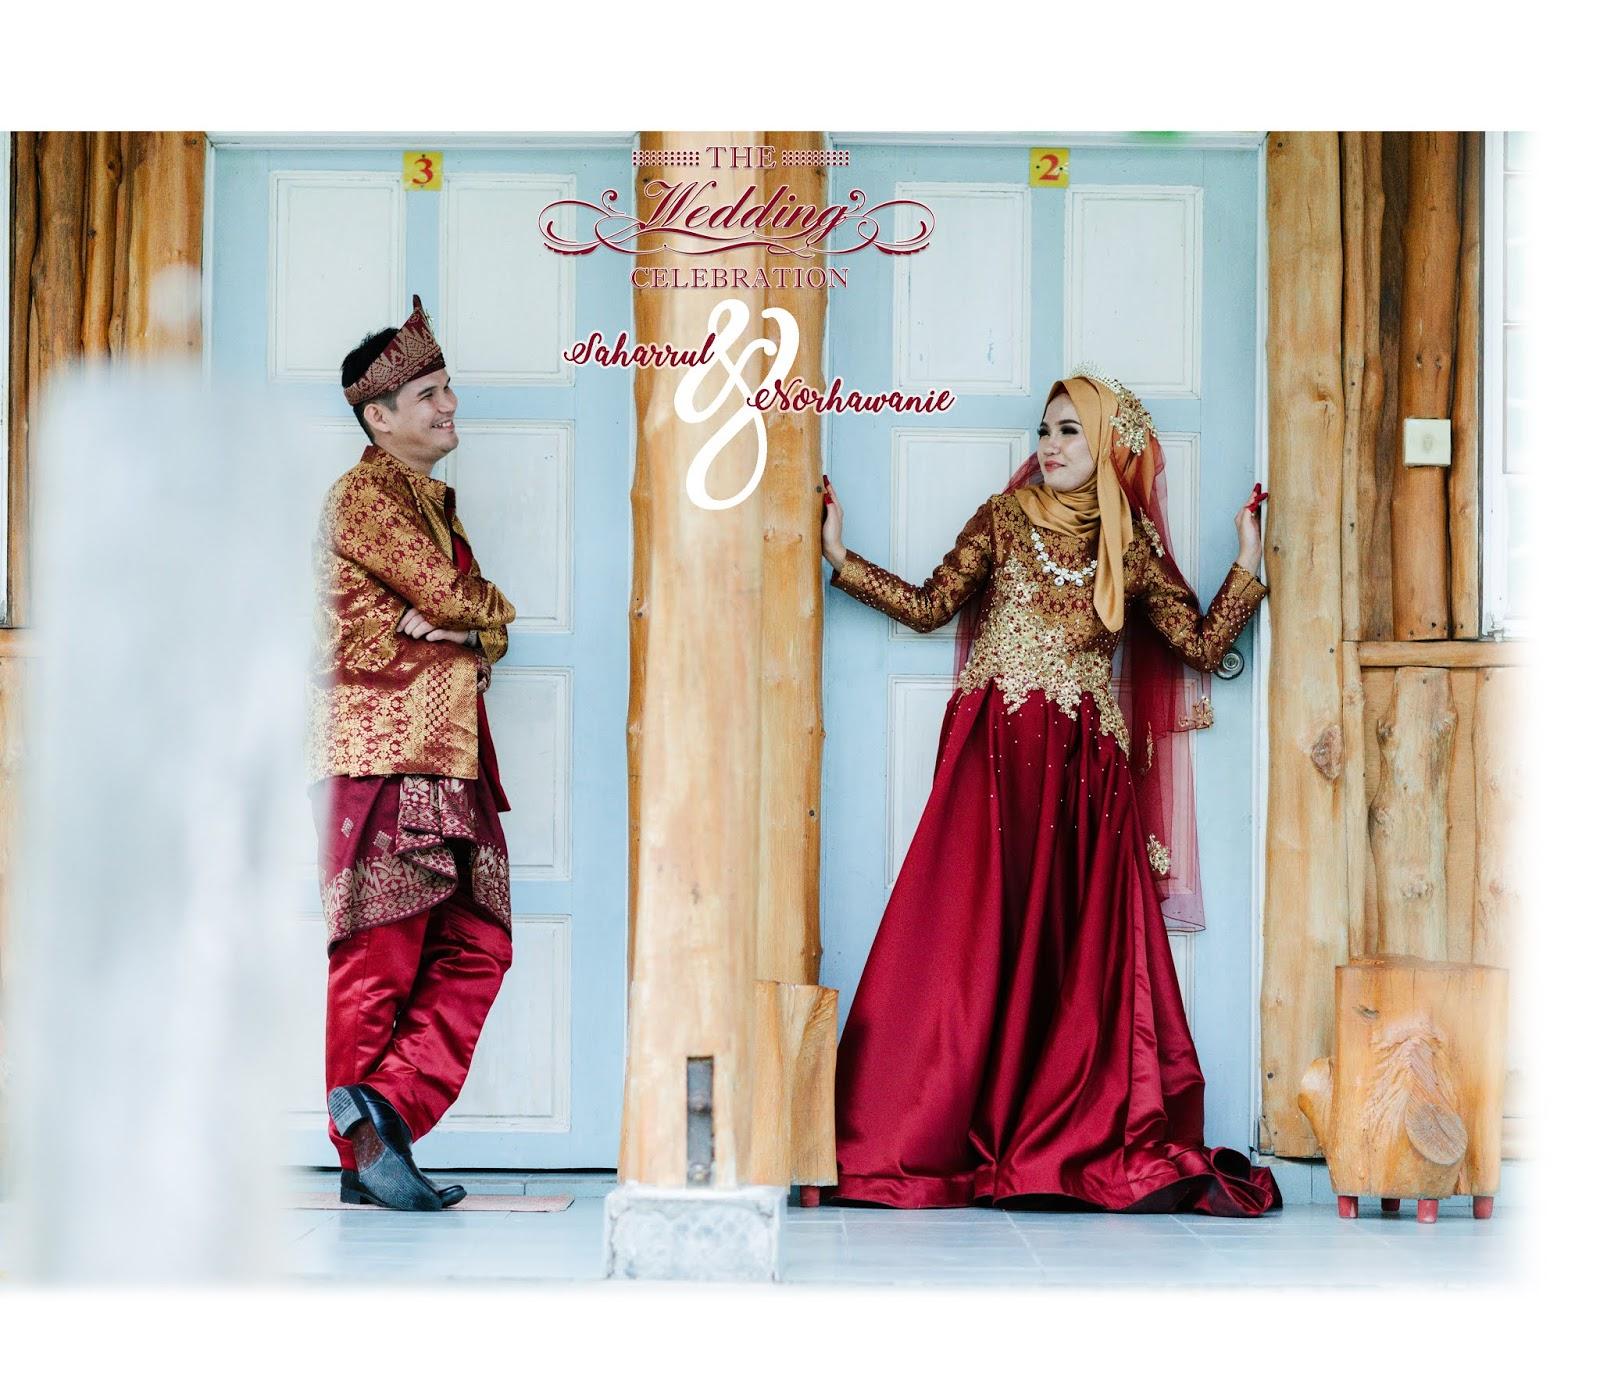 Norhawanie + Saharrul